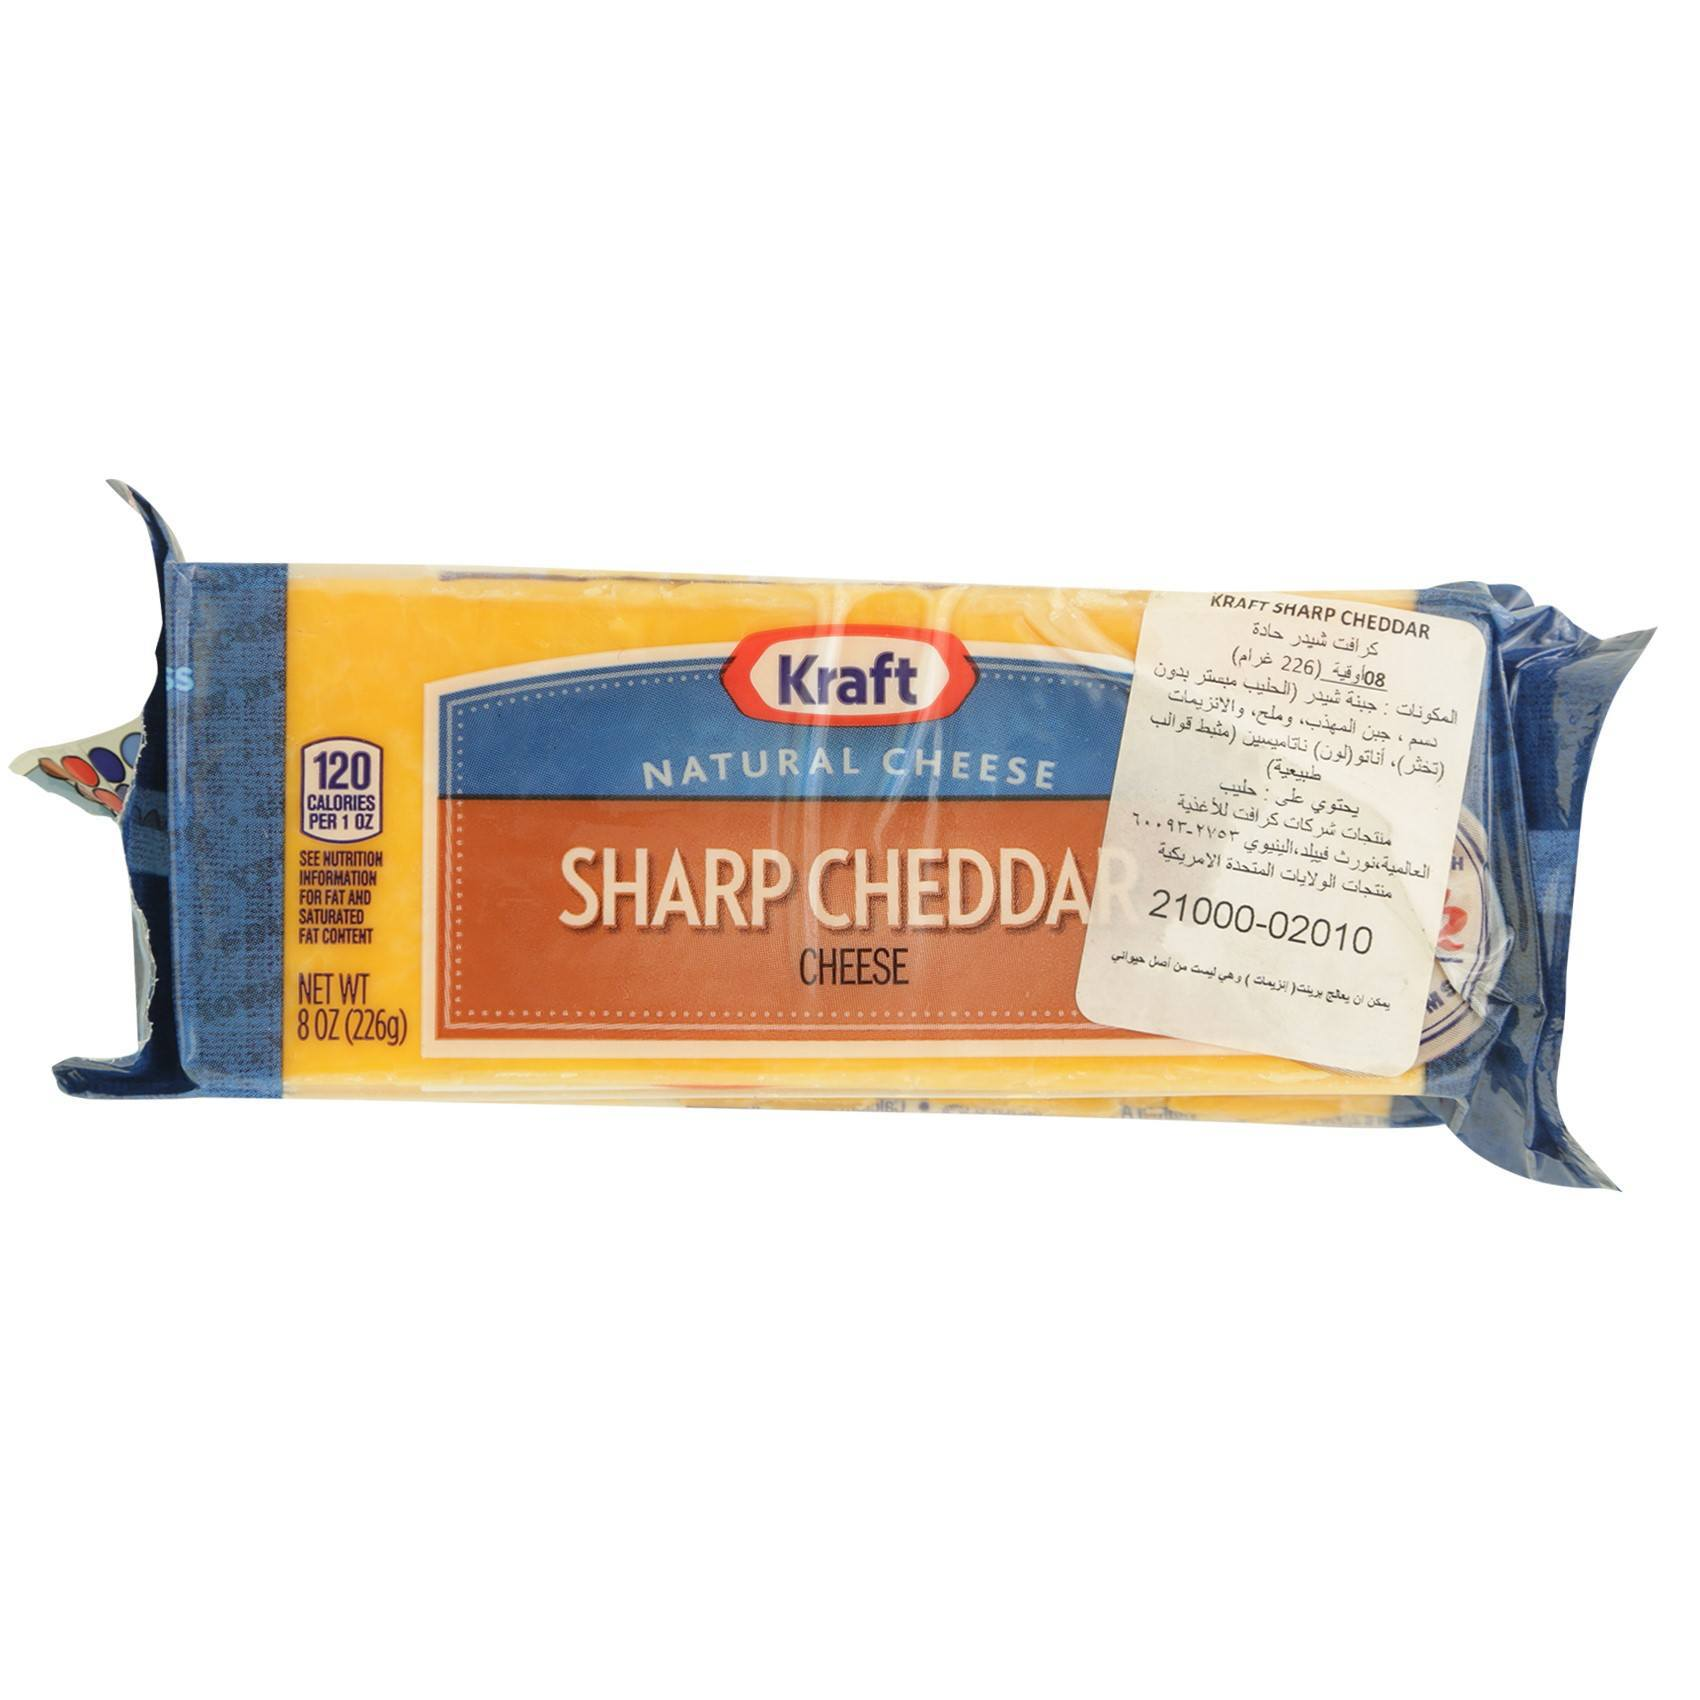 KRAFT CHUNK CHEDDAR SHARP 226G